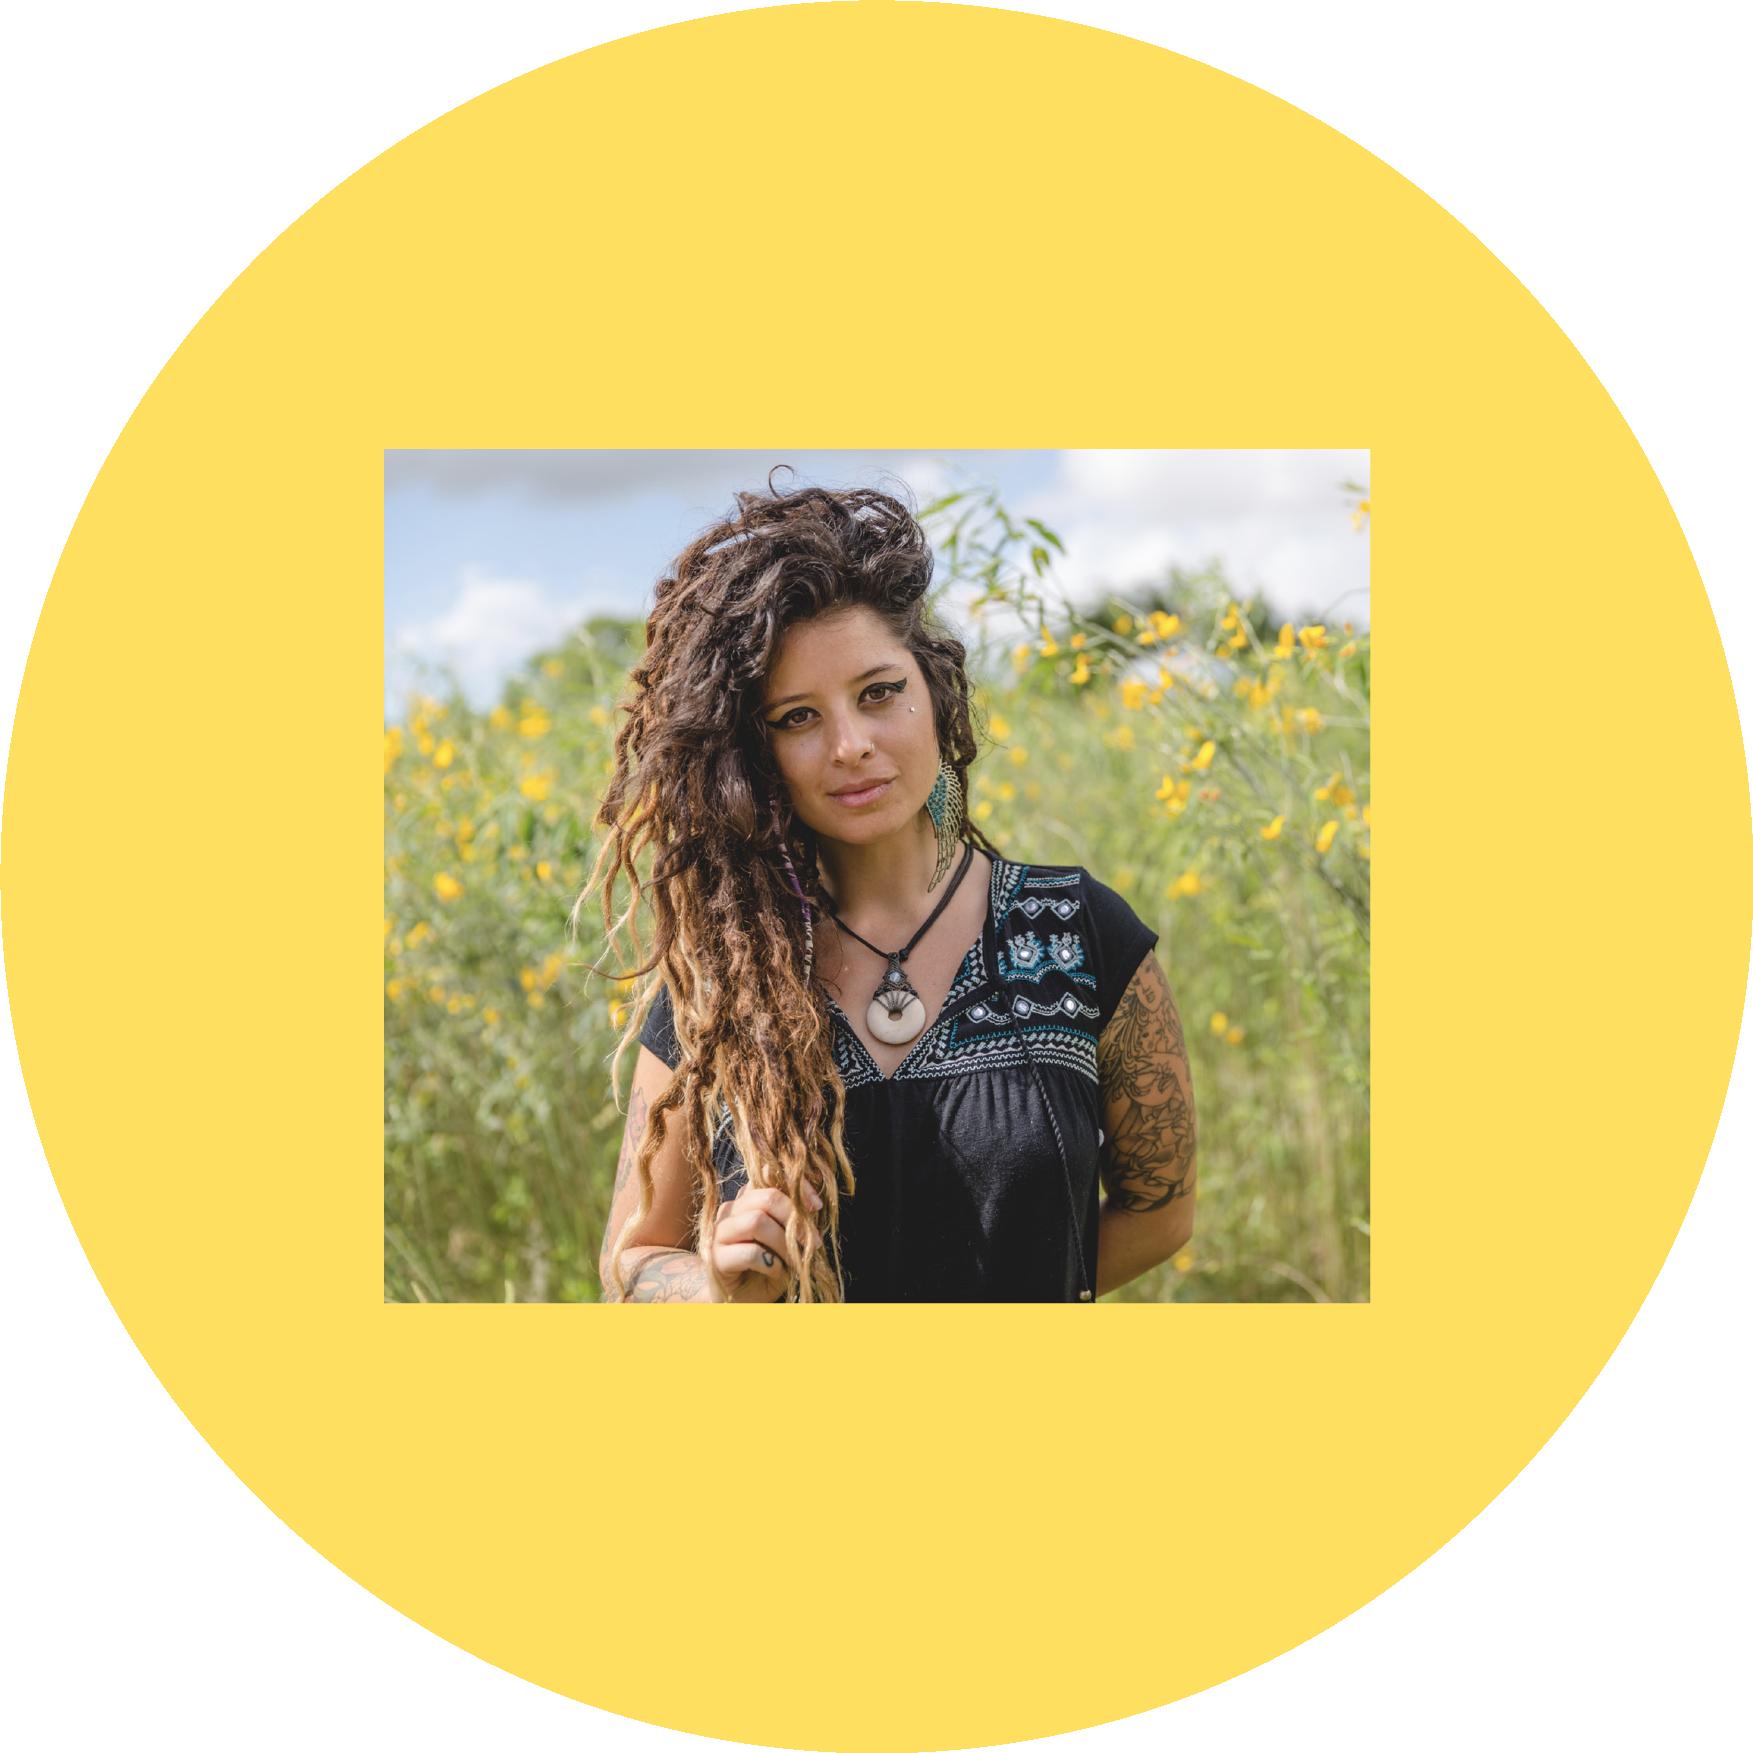 04.06.18 | Girl Talks at AWOM Lab: Pamela Wasabi